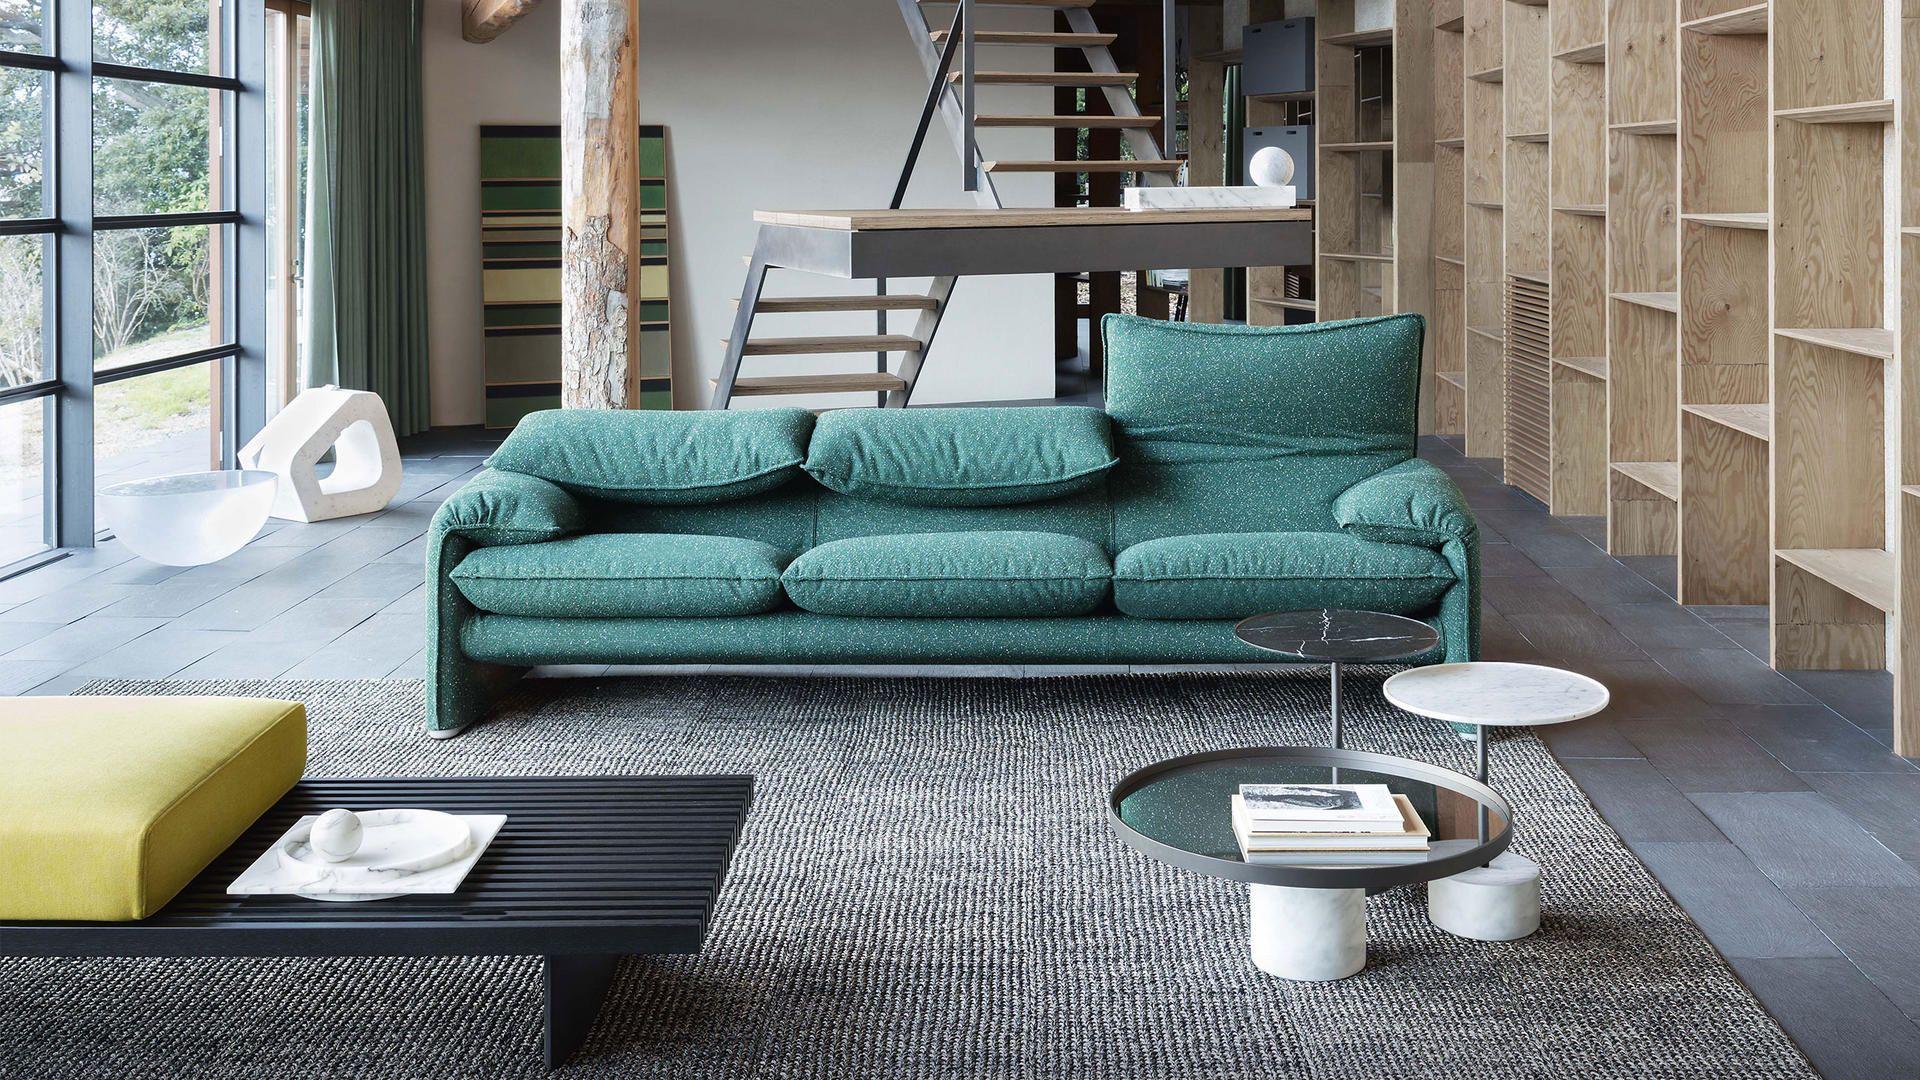 Divano maralunga by cassina da gallianohabitat indoor design sofa furniture furniture - Divano maralunga cassina ...